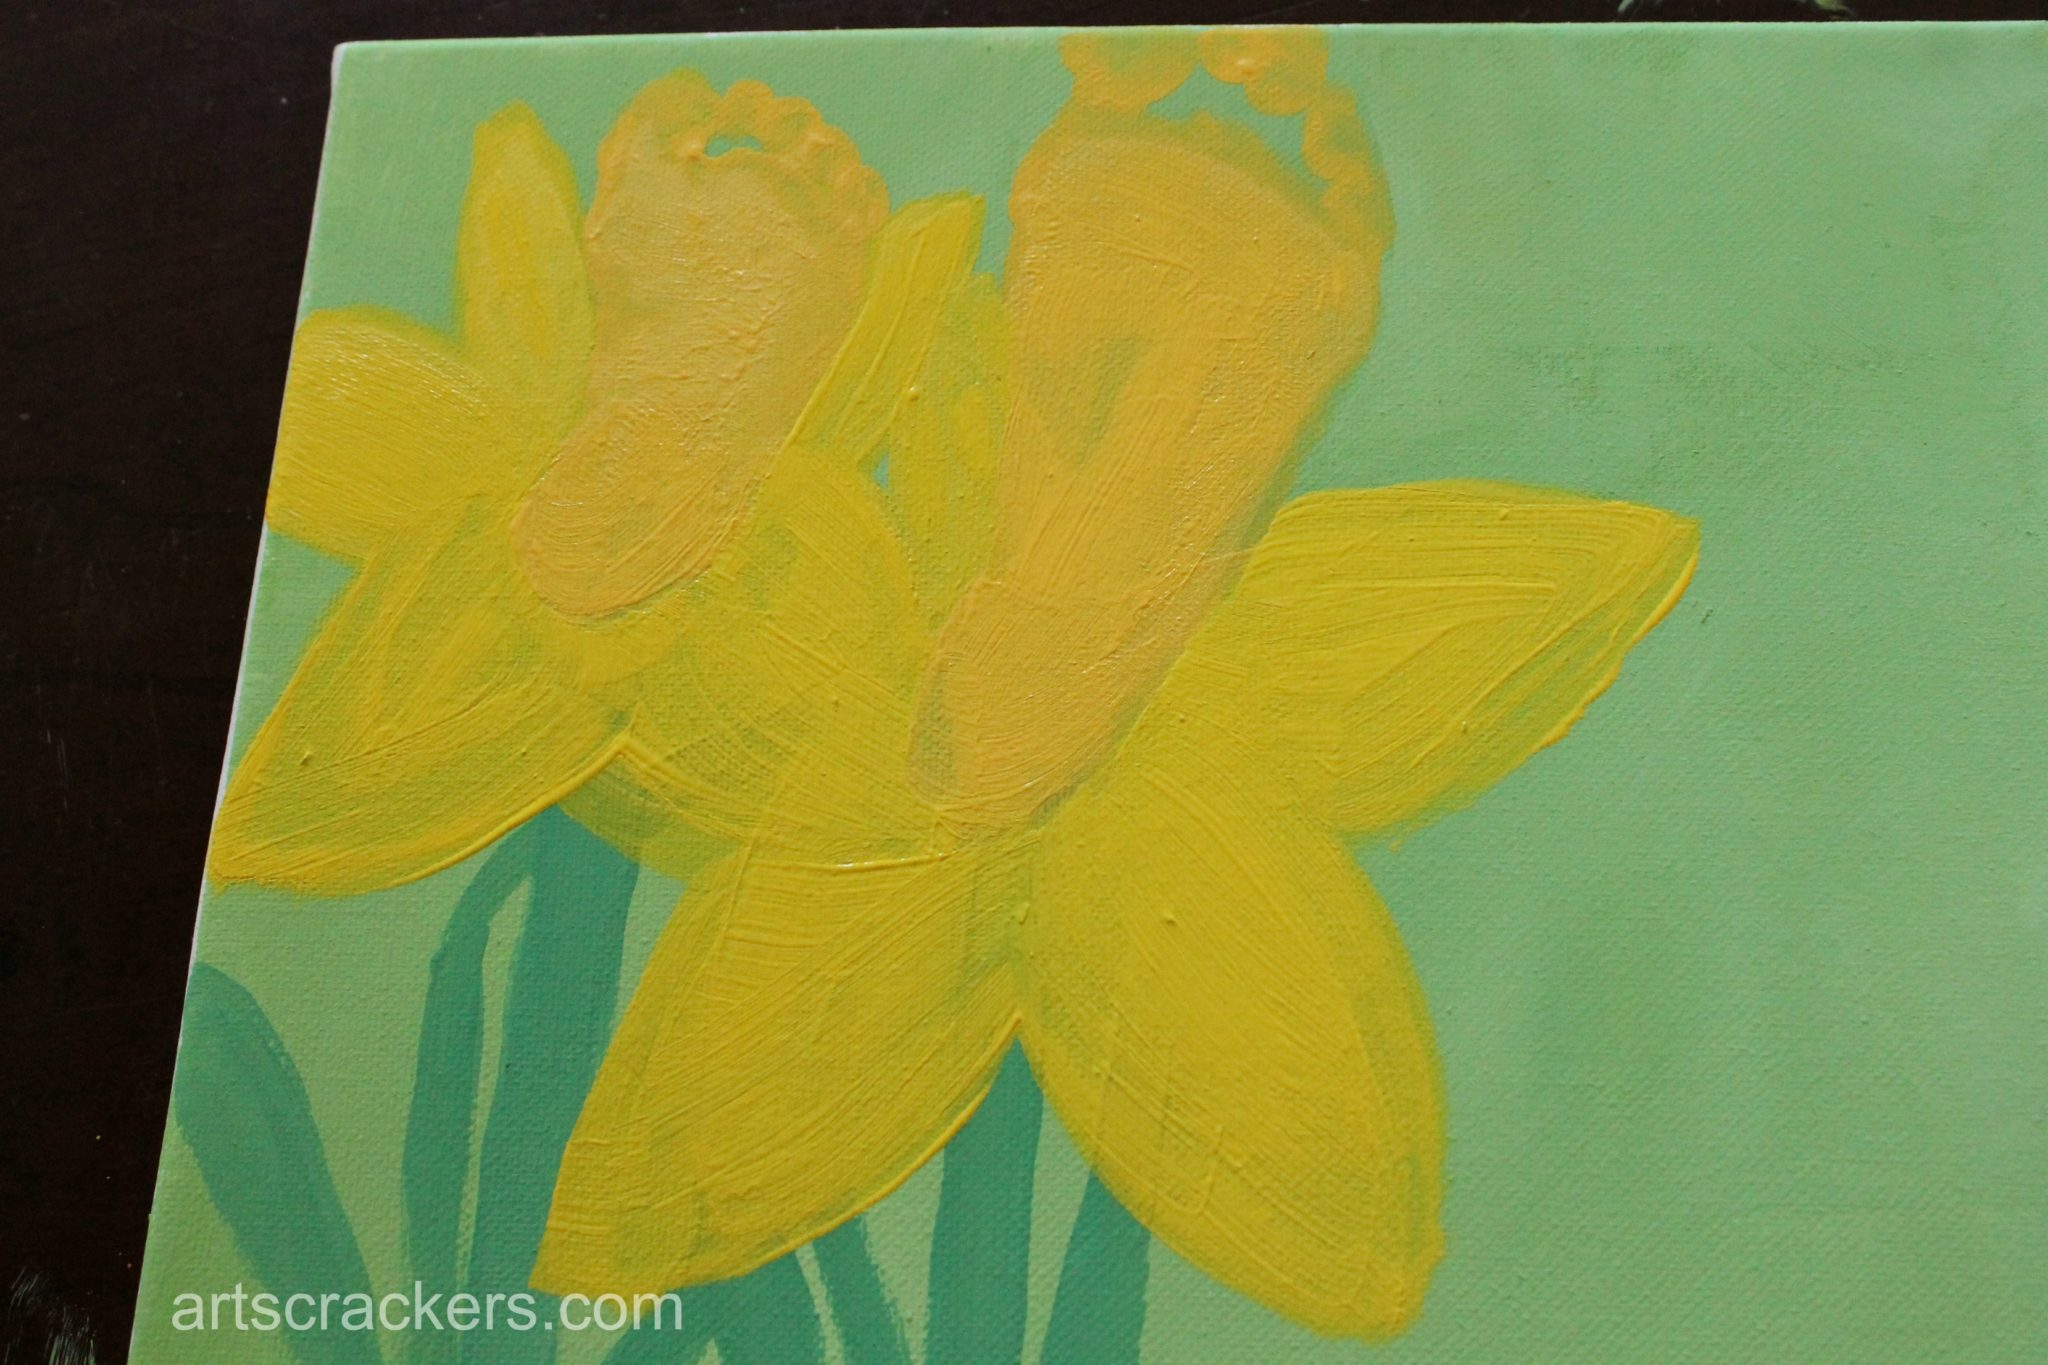 Handprint and Footprint Spring Flowers Step 5